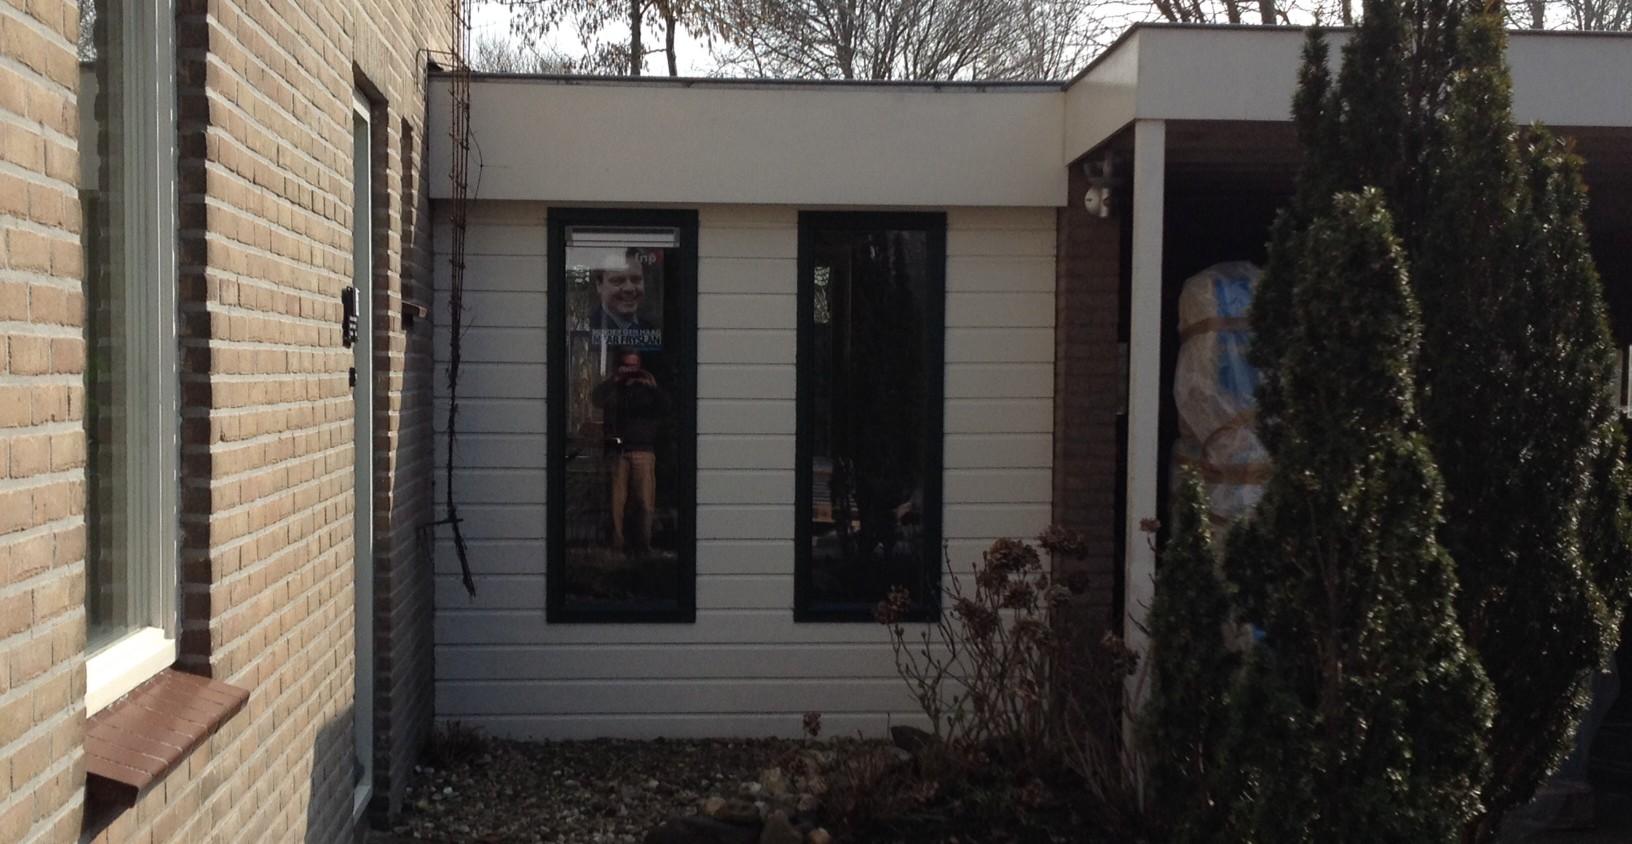 Extra Kamer Maken : Berging wordt extra kamer Witmarsum (2015 ...